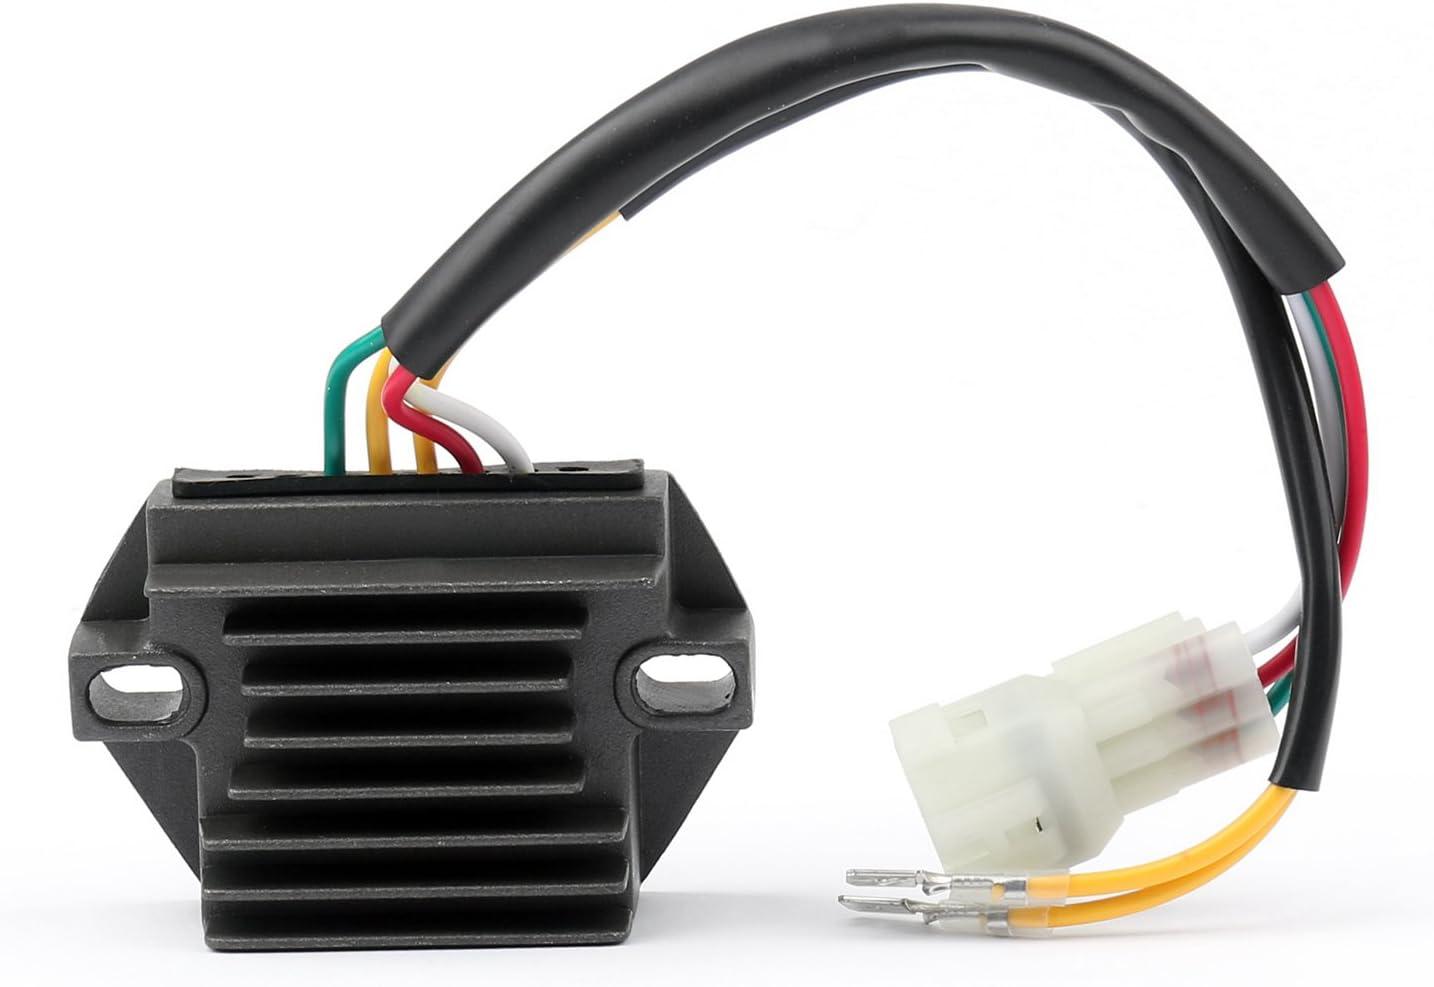 Topteng New Voltage Regulator Rectifier for KTM 250 450 SX-F 350 XC-F SMR MUSQUIN REPLICA